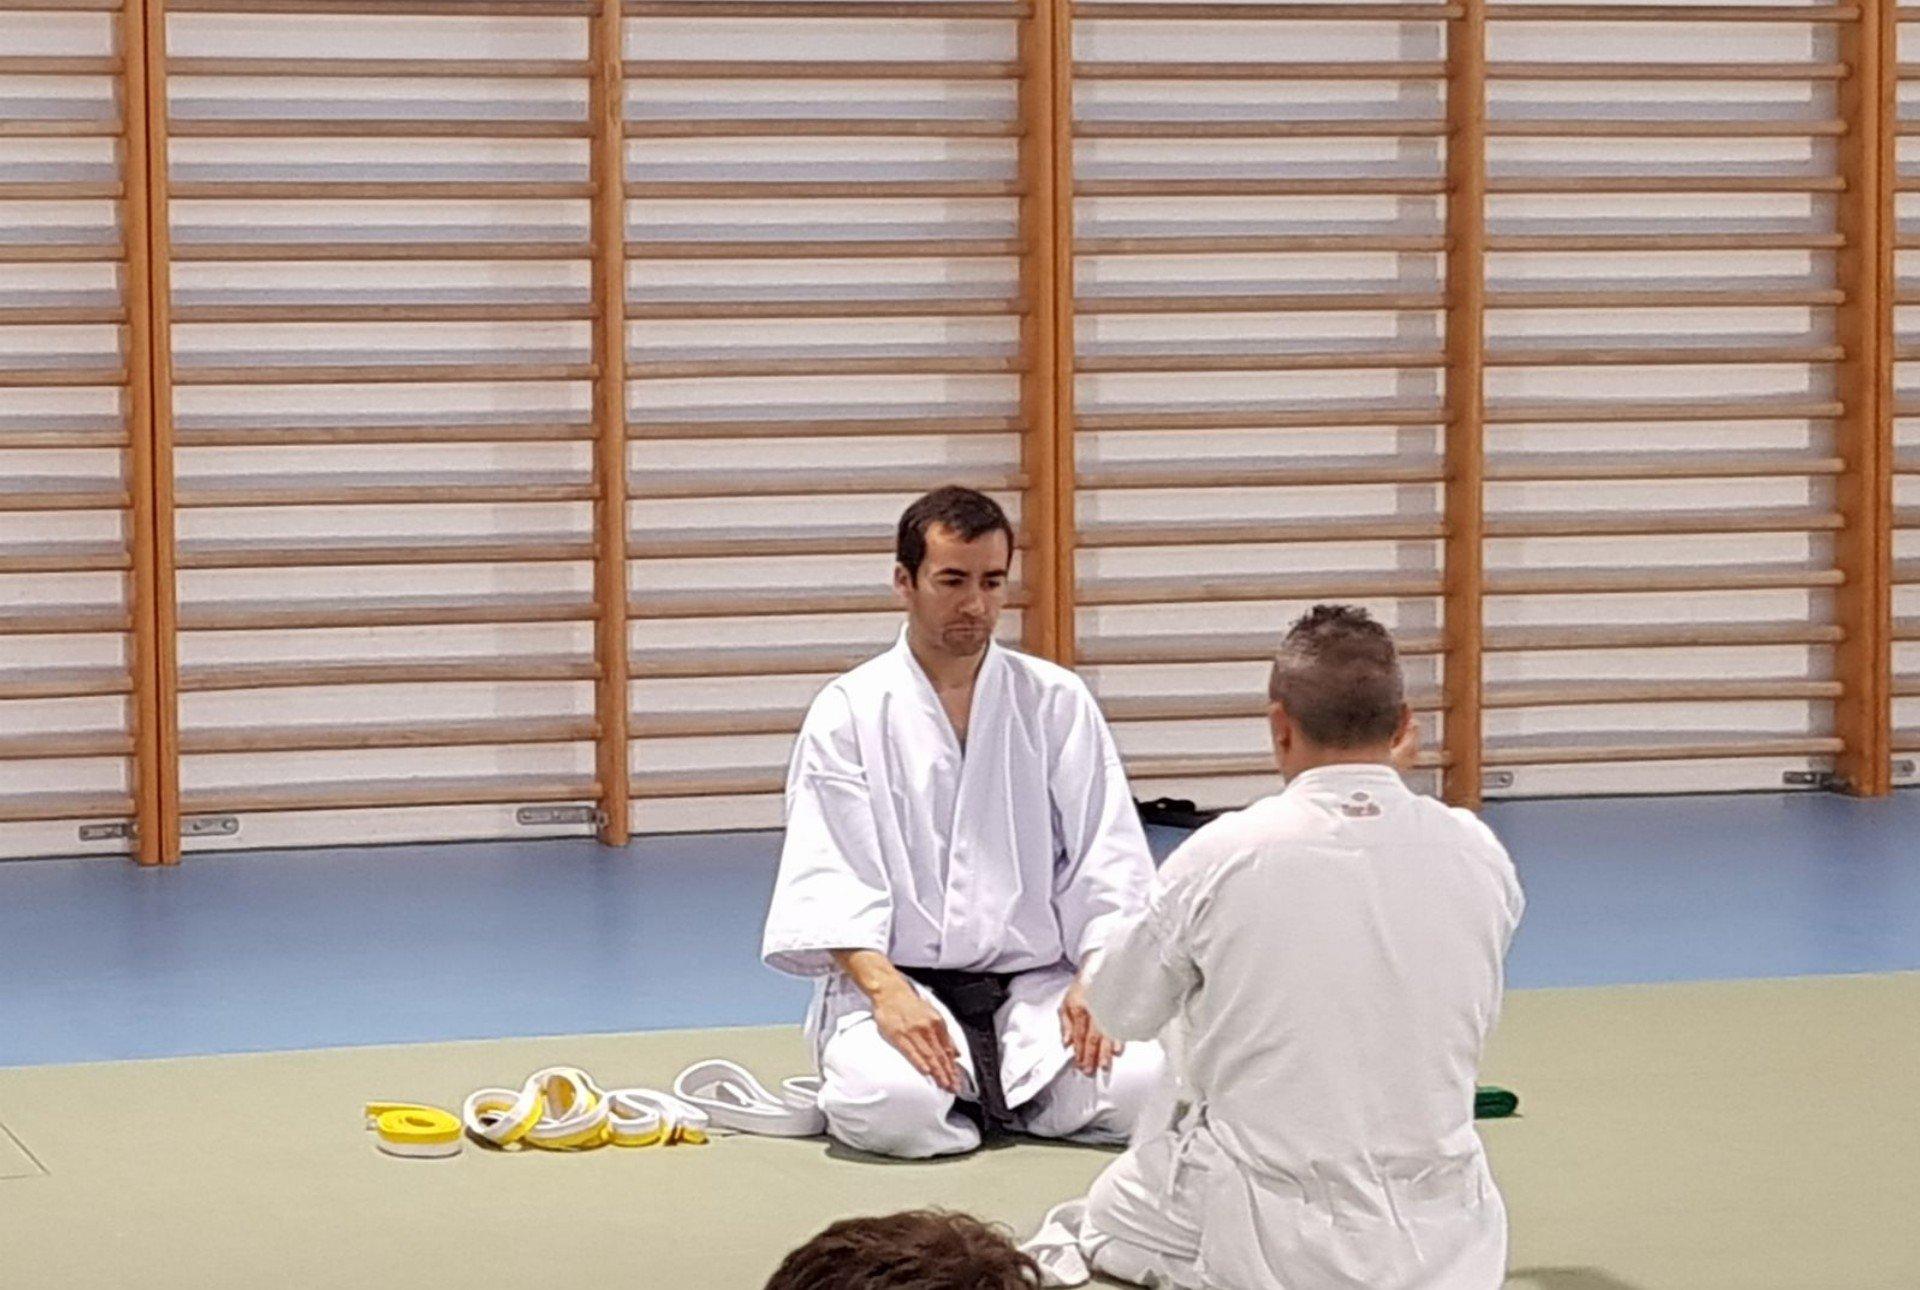 entrega de cinturon de karate en la escuela dojo kaisho